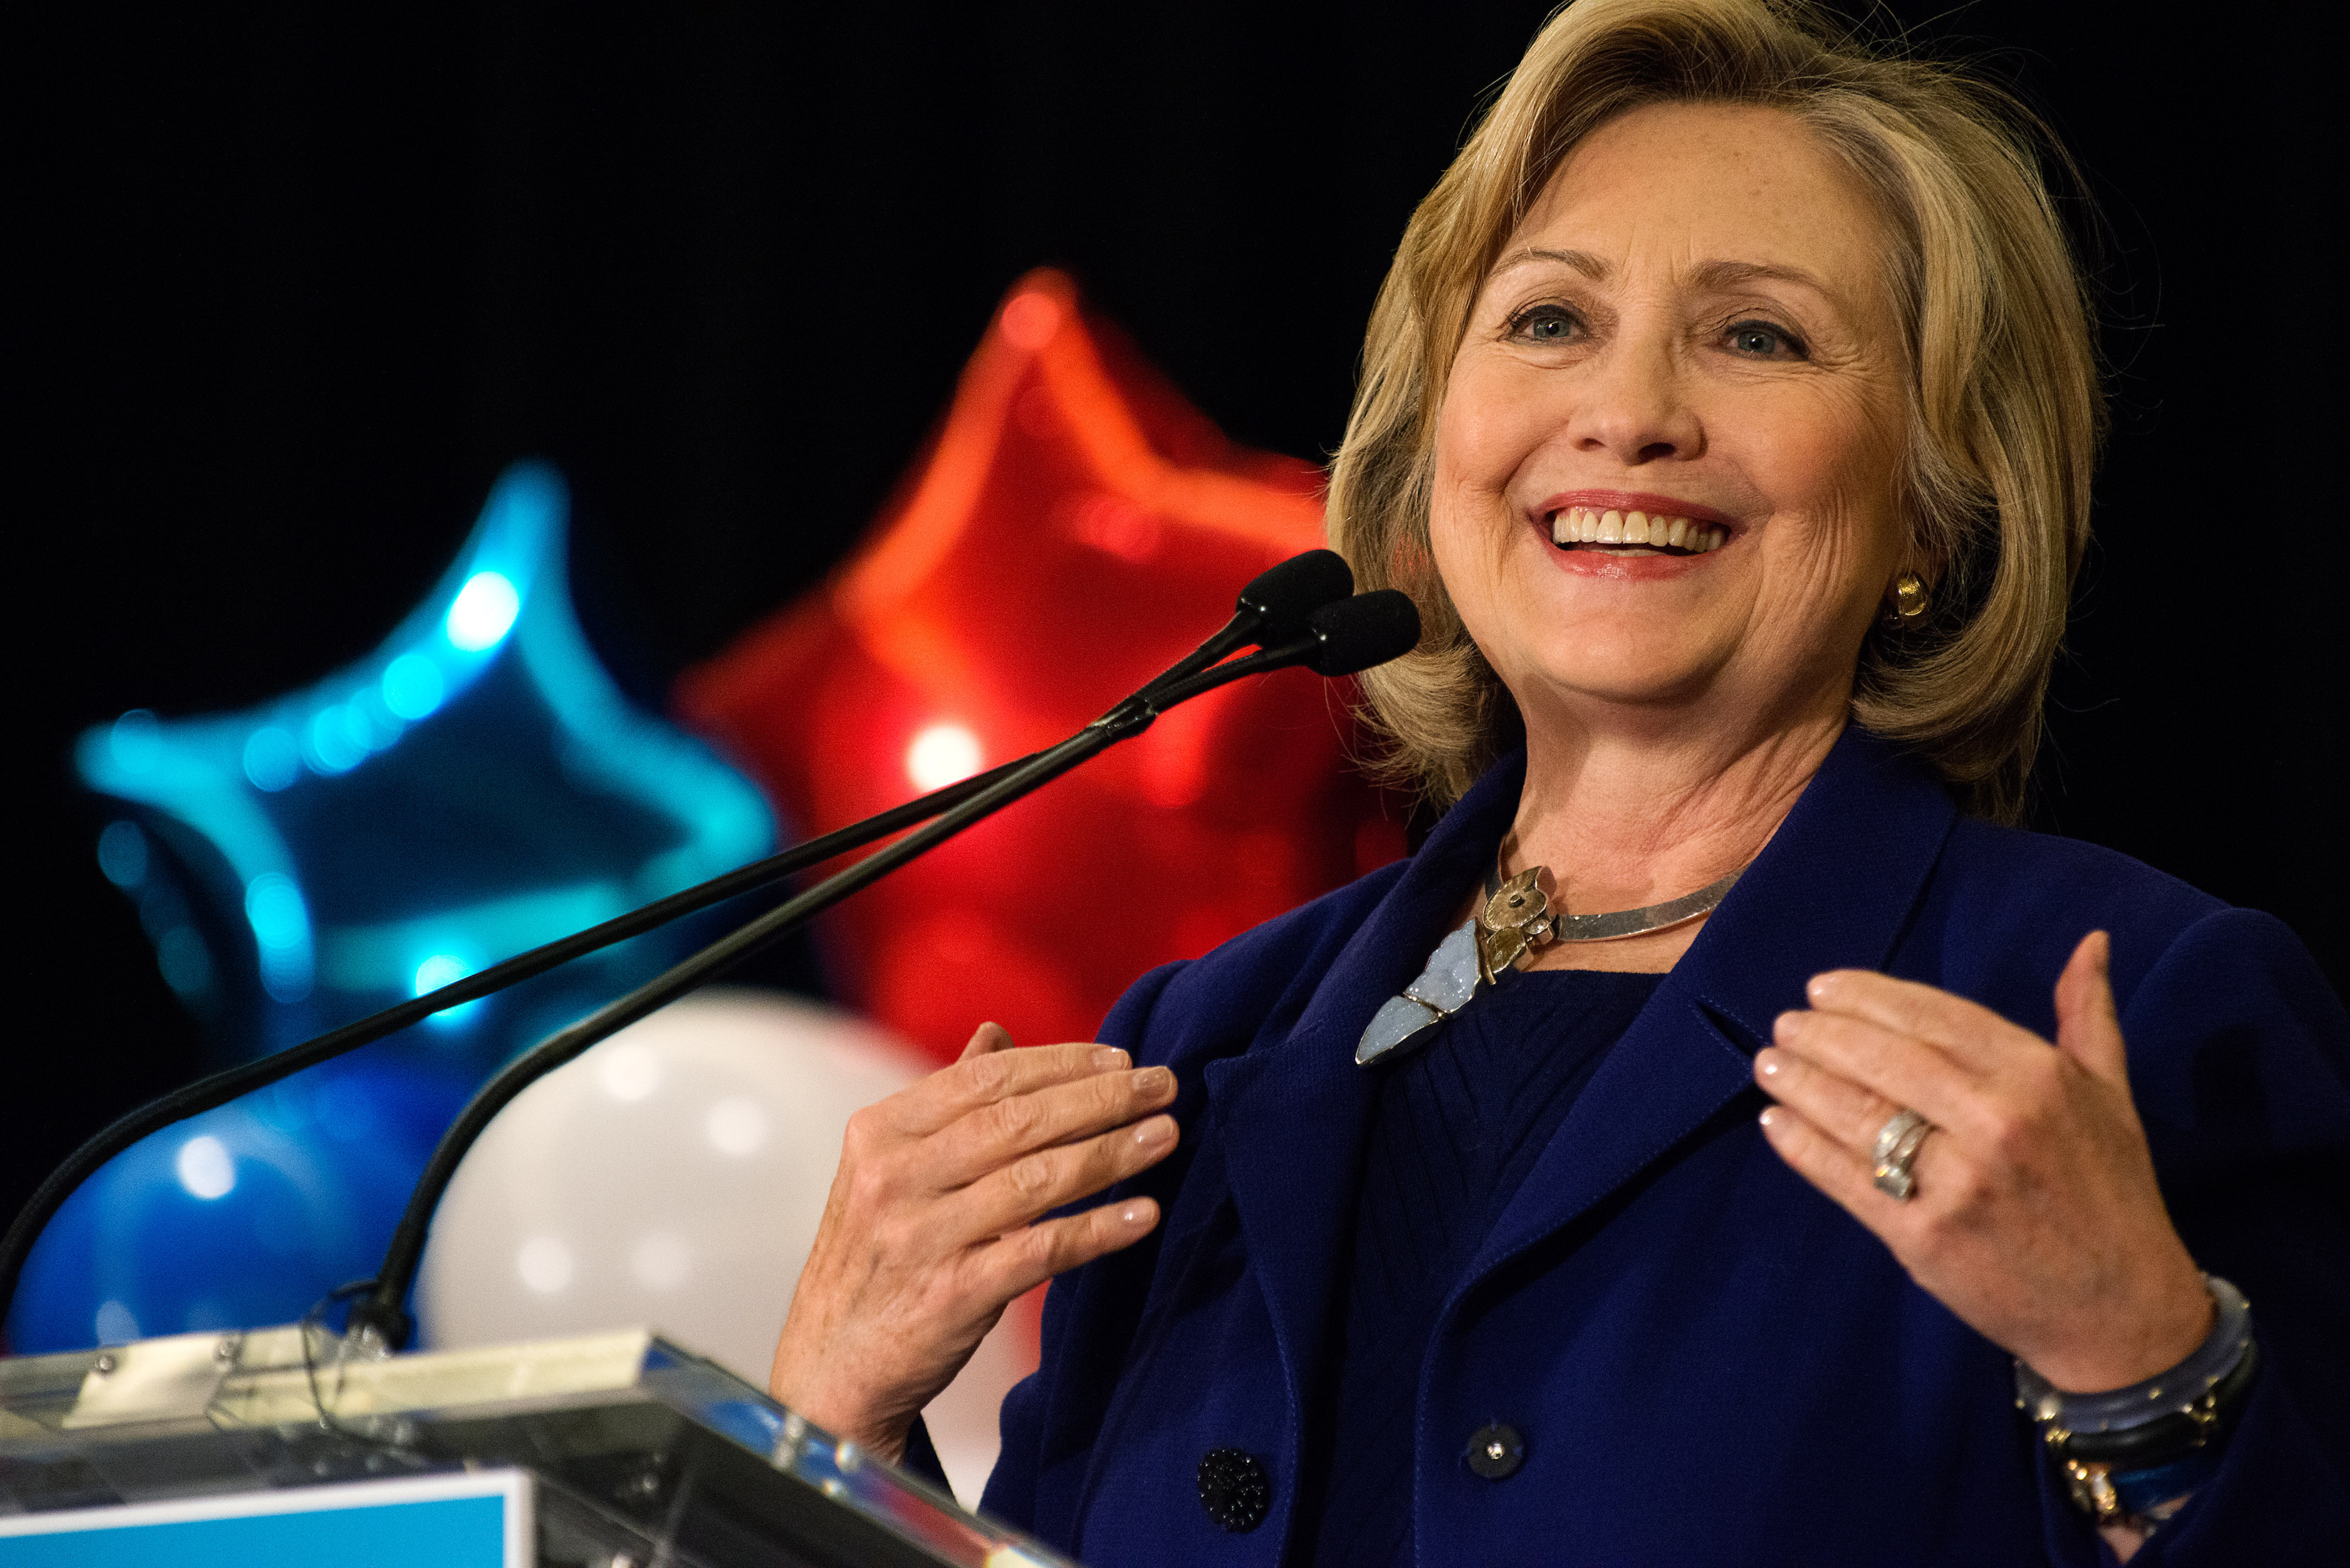 Hillary Clinton. (Photo: Bryan Thomas/Getty Images)